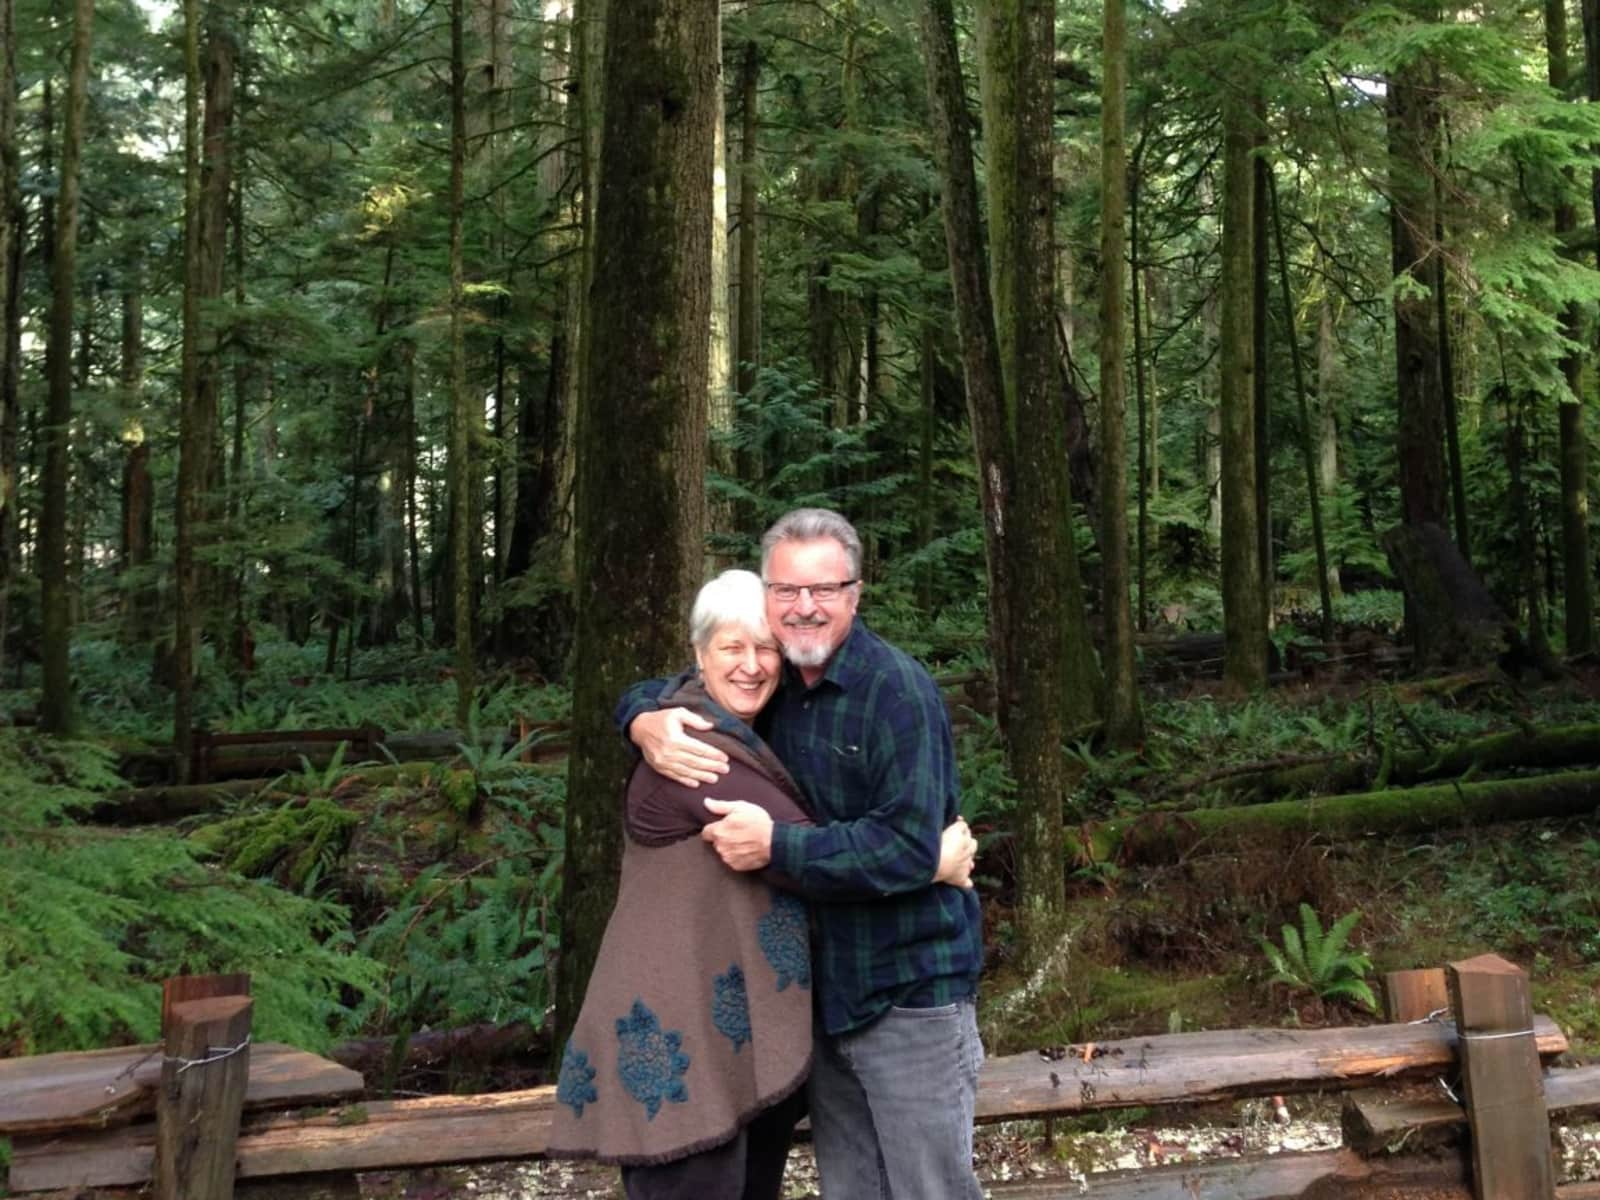 David & Vivian from Lunenburg, Nova Scotia, Canada